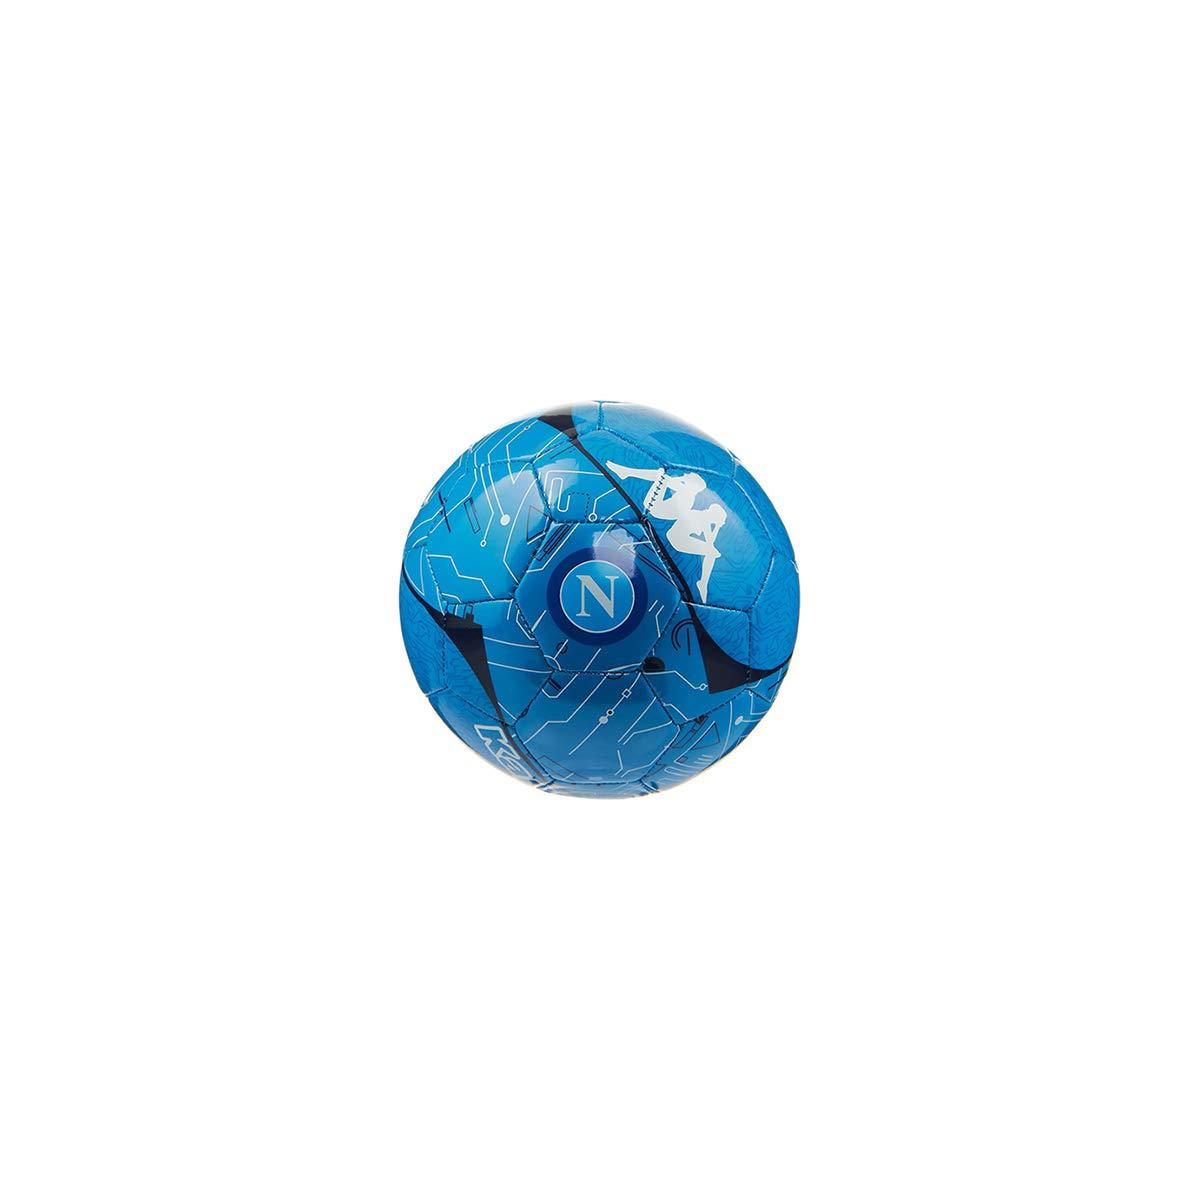 Kappa Mini balón Player, Adultos Unisex, Azul/Blanco, Talla 02 ...